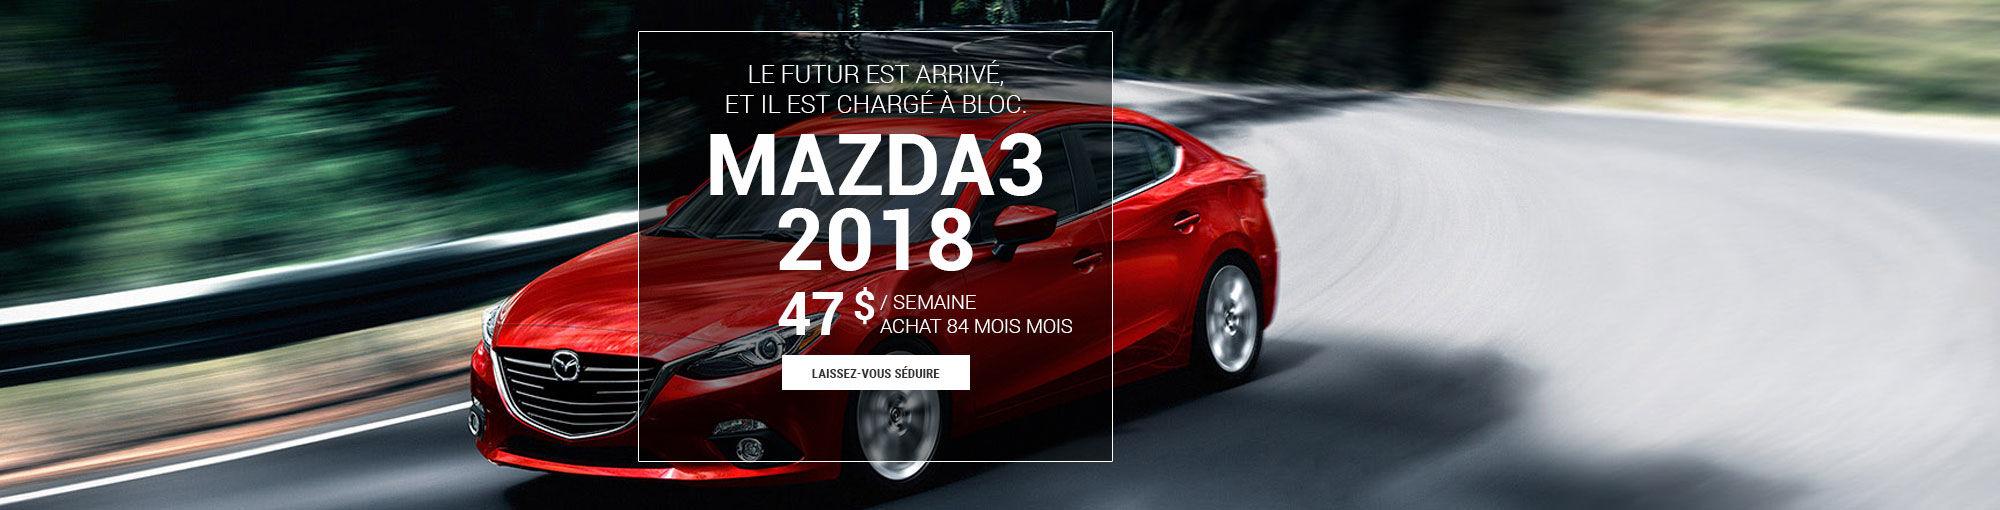 Mazda3 2018 - septembre